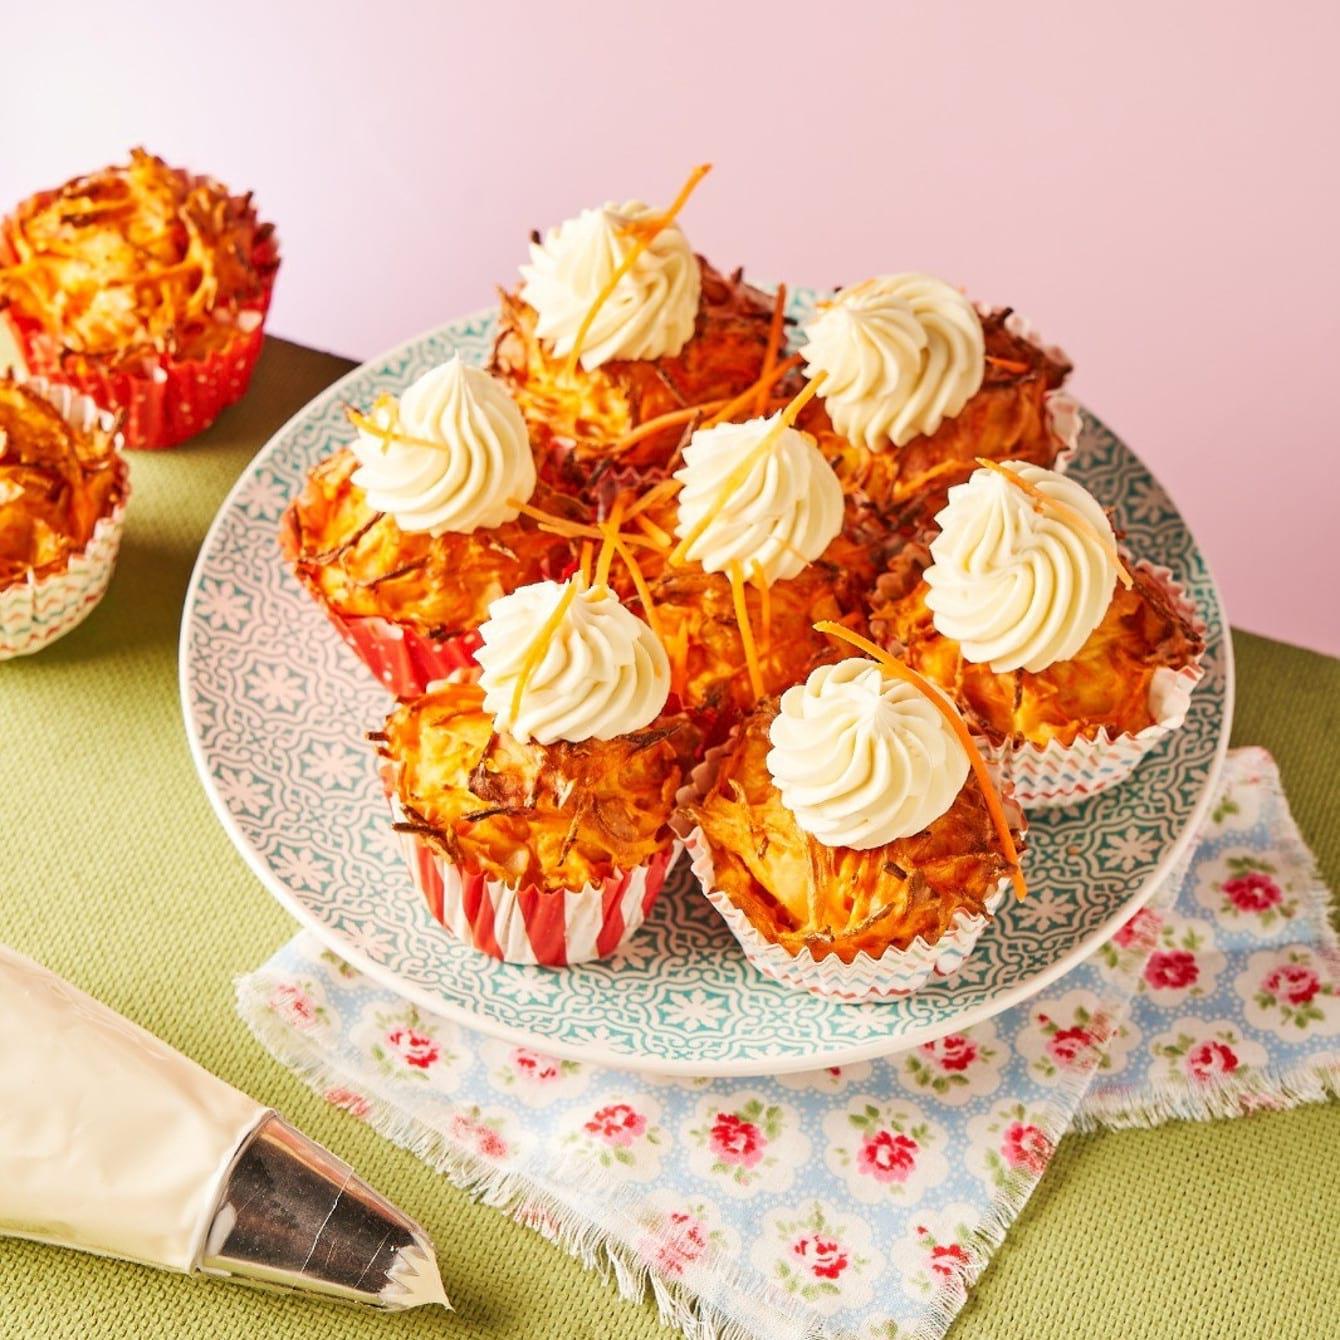 Groenten cupcakes